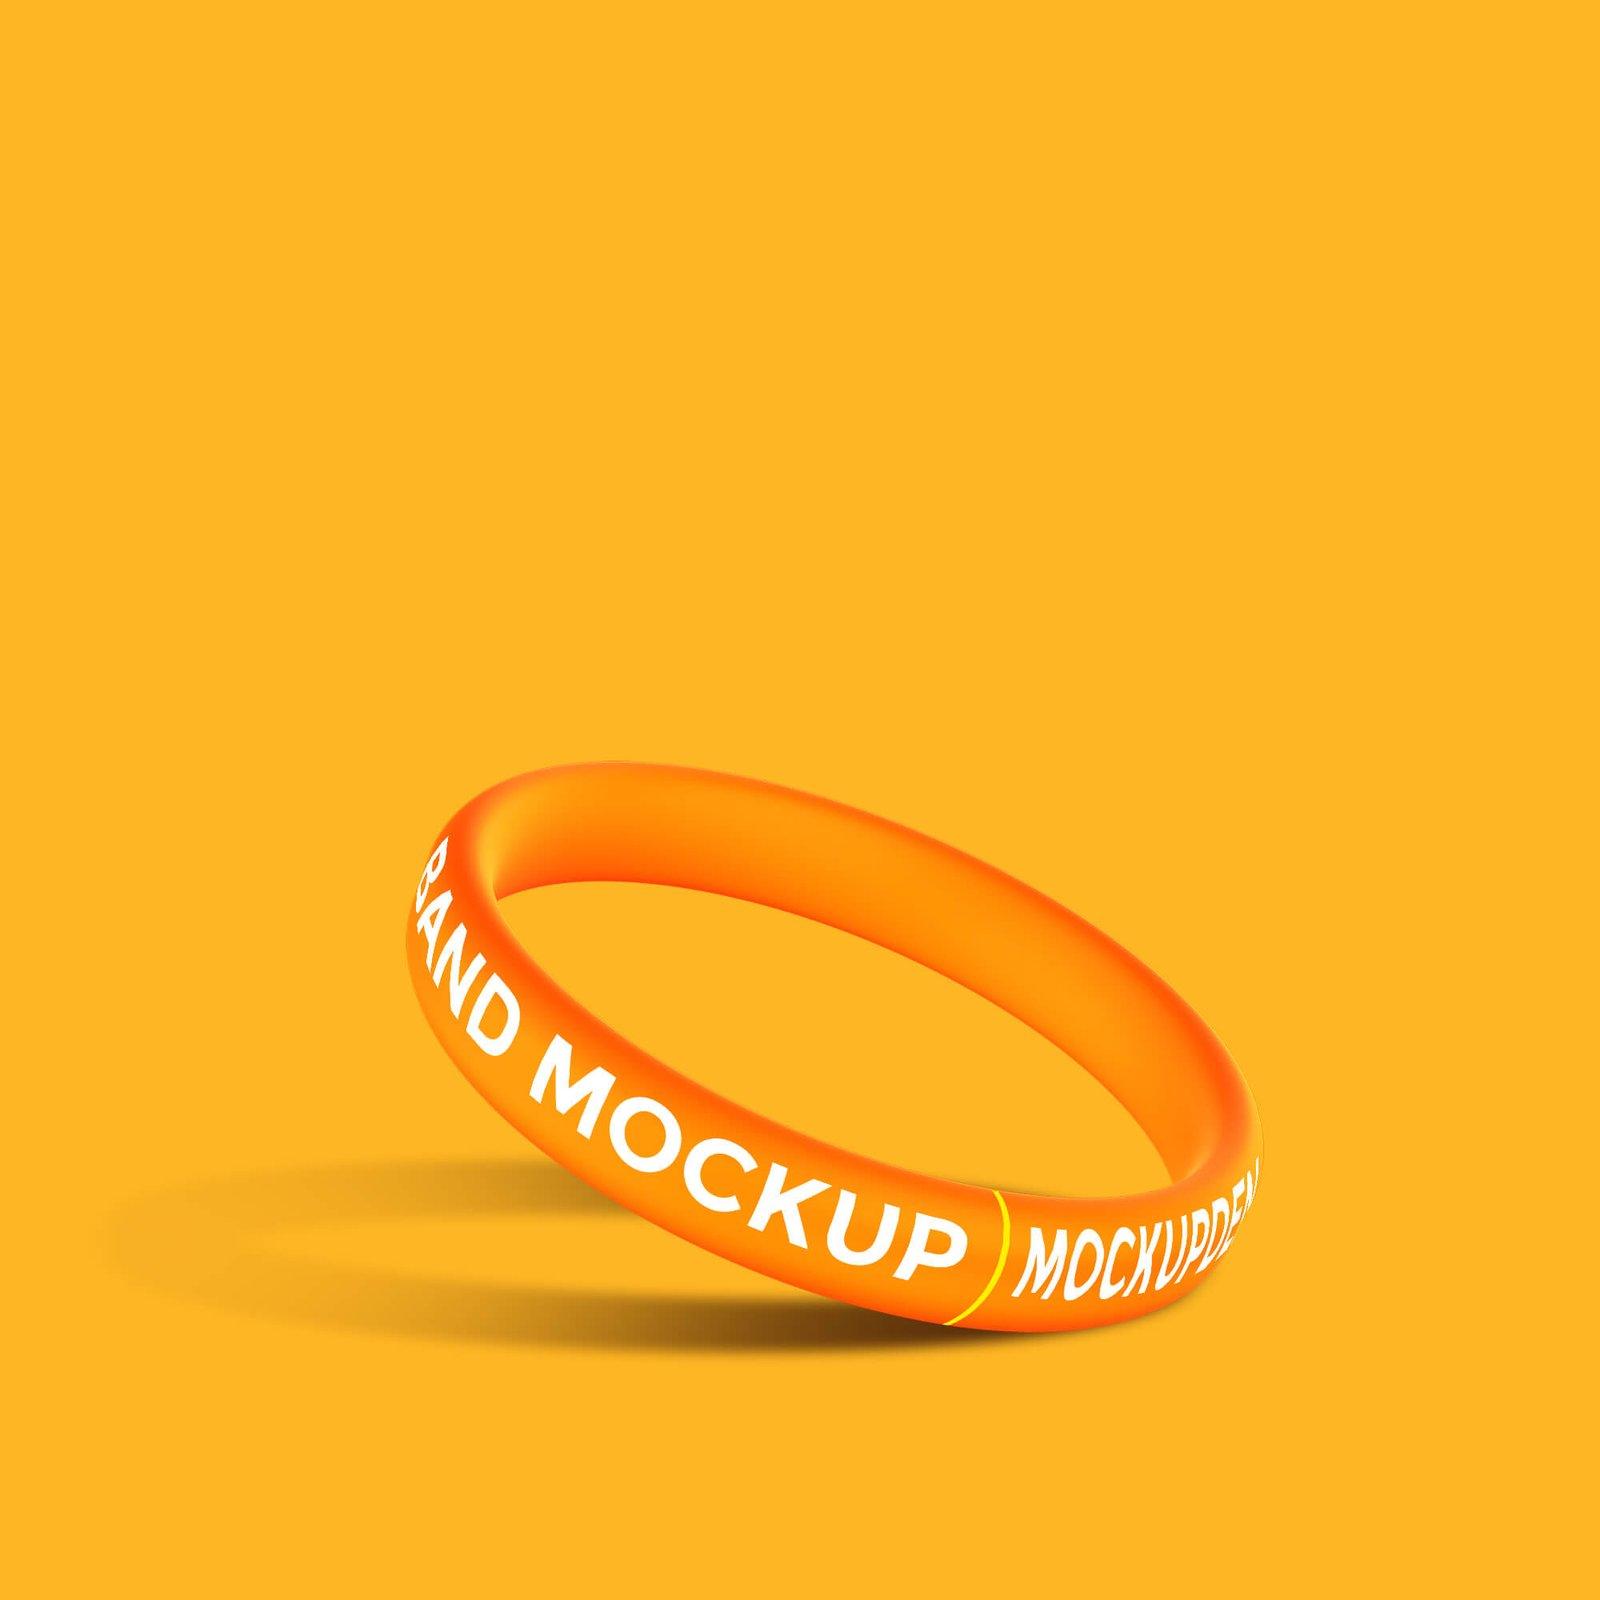 Design Free Band Mockup PSD Template